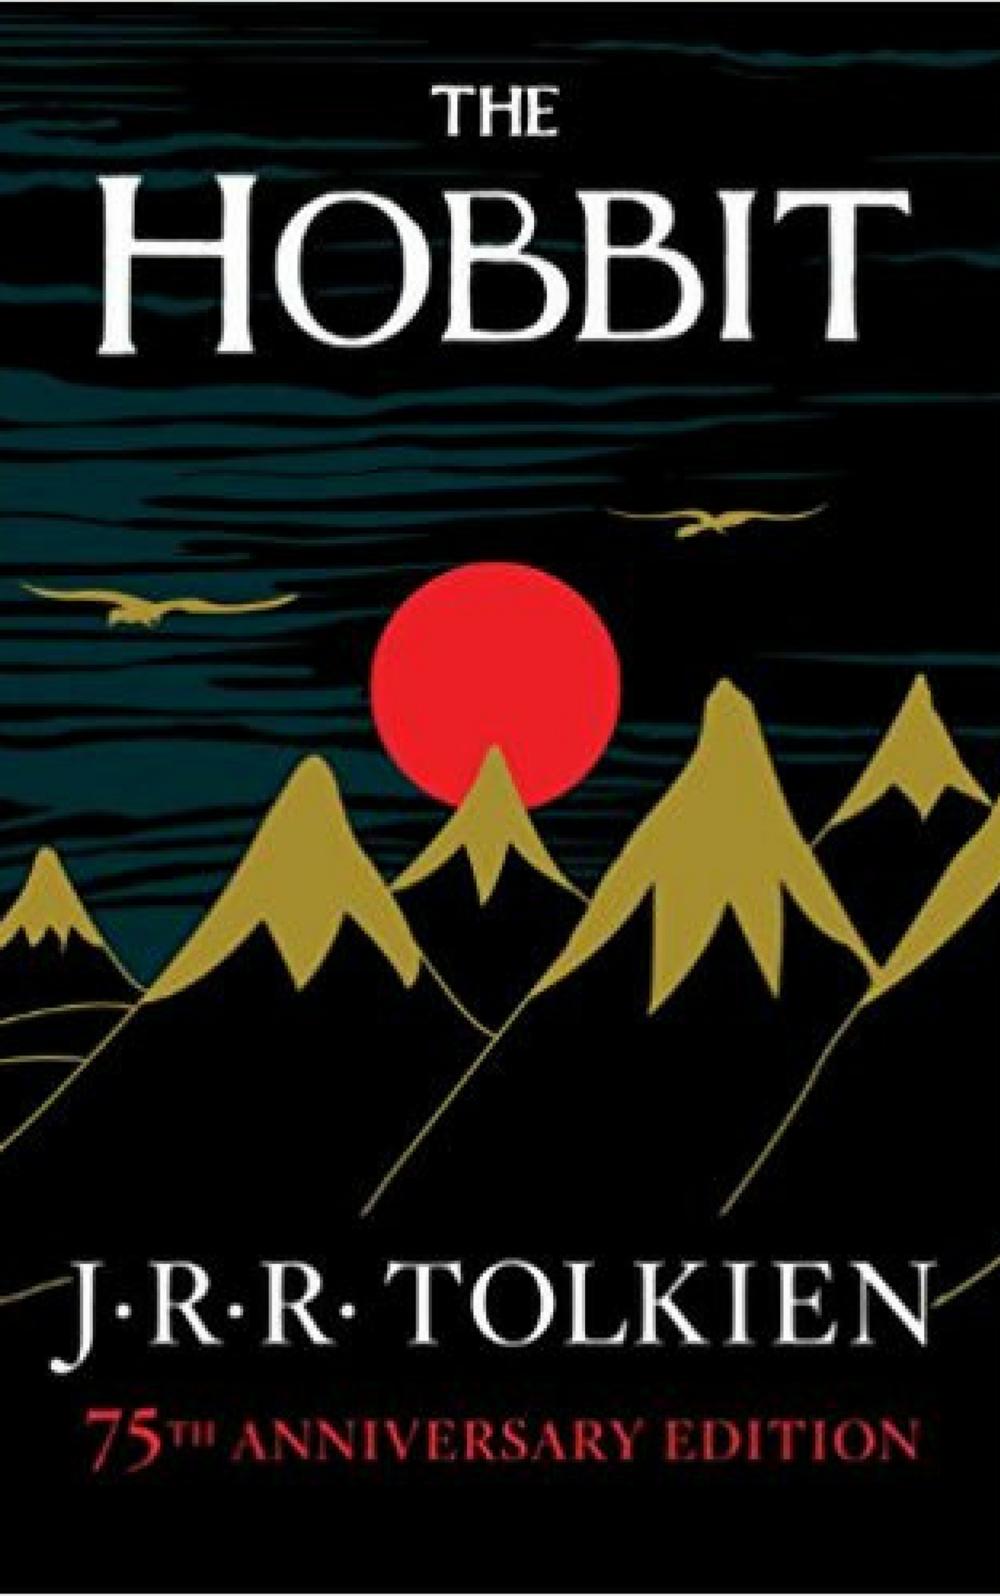 The Hobbit (Canva).png